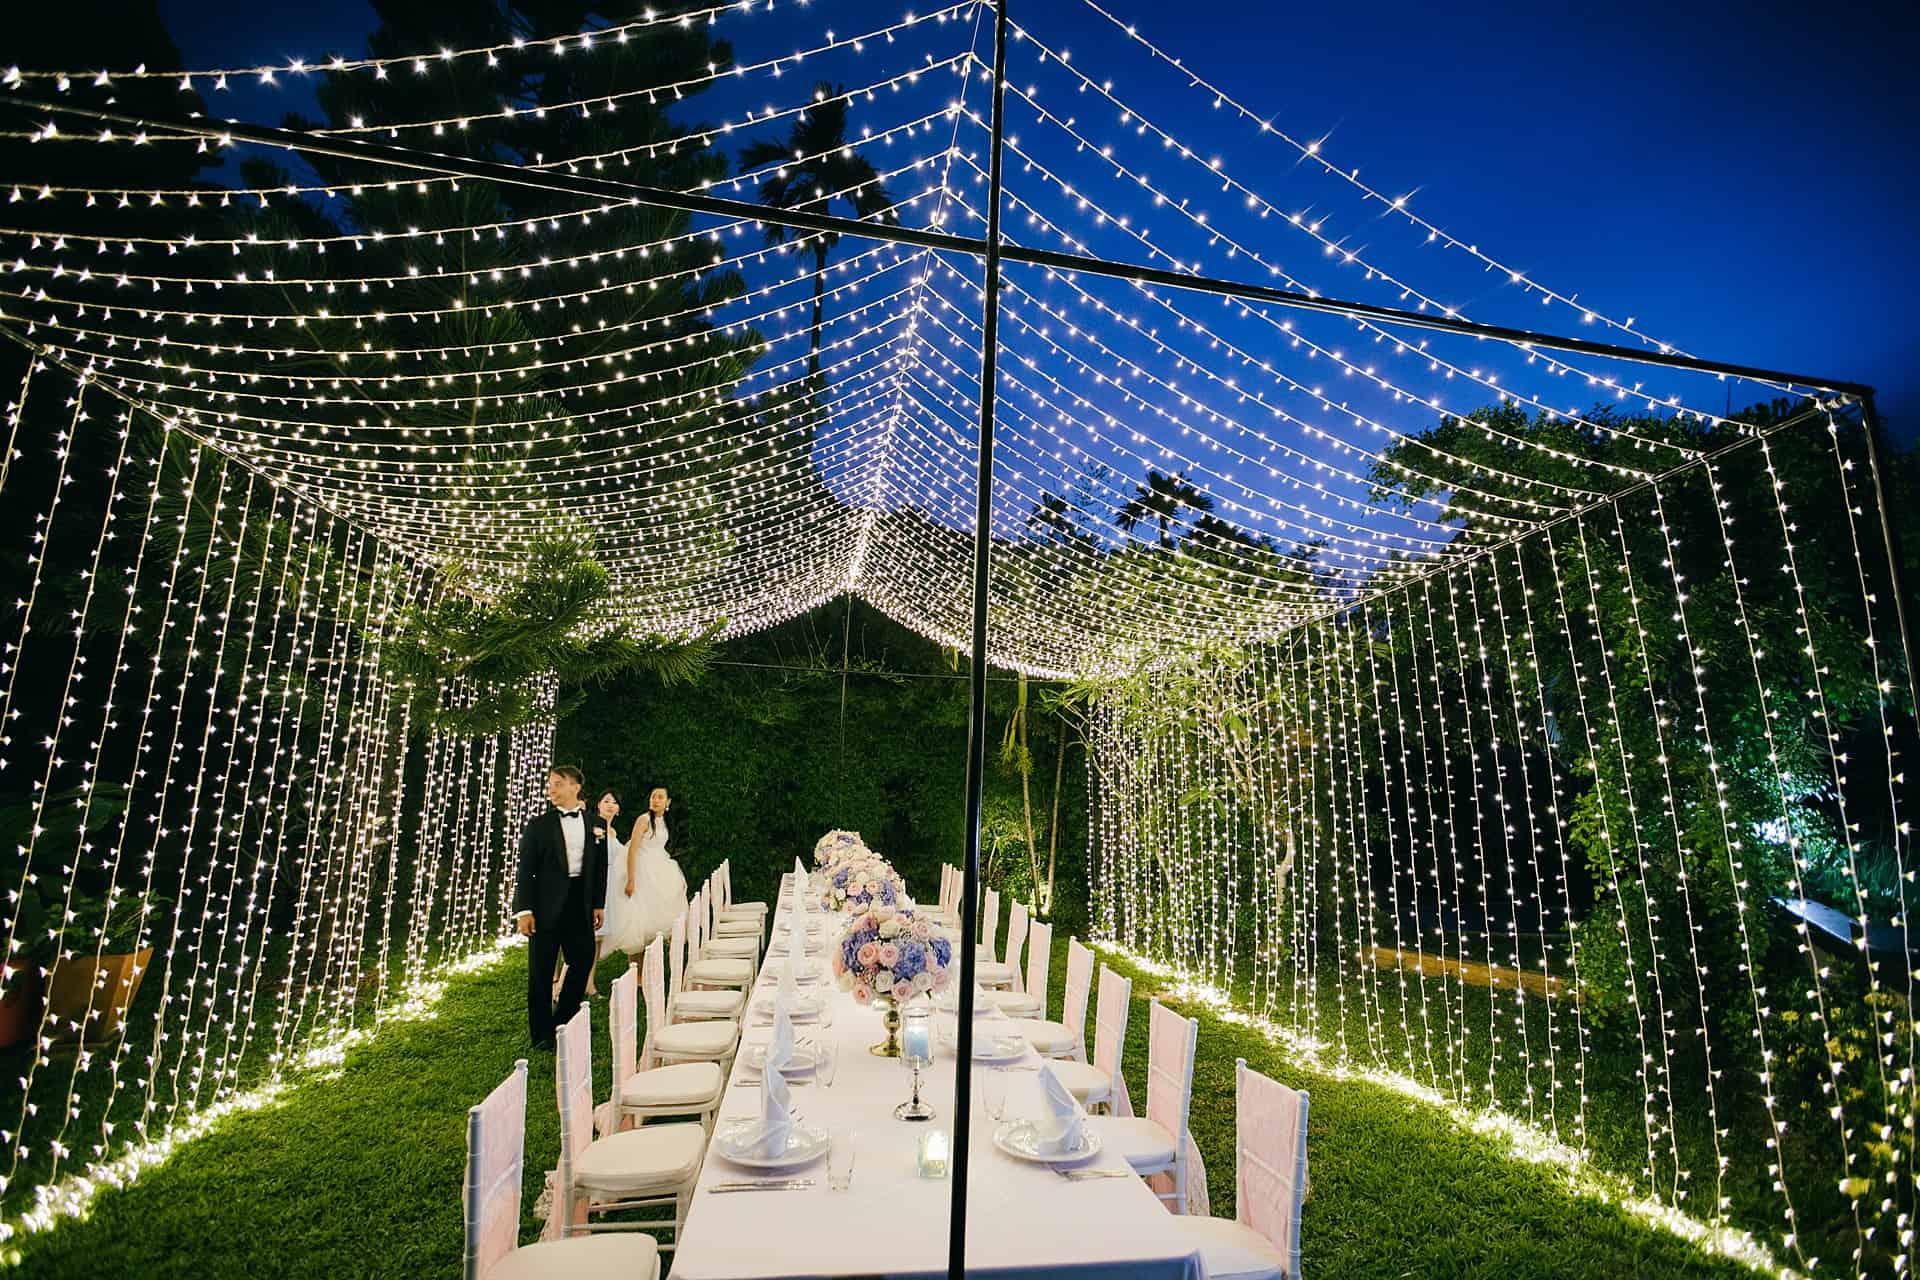 Wedding Haruka & Ronny, Hua Beach 8th September 2018 56